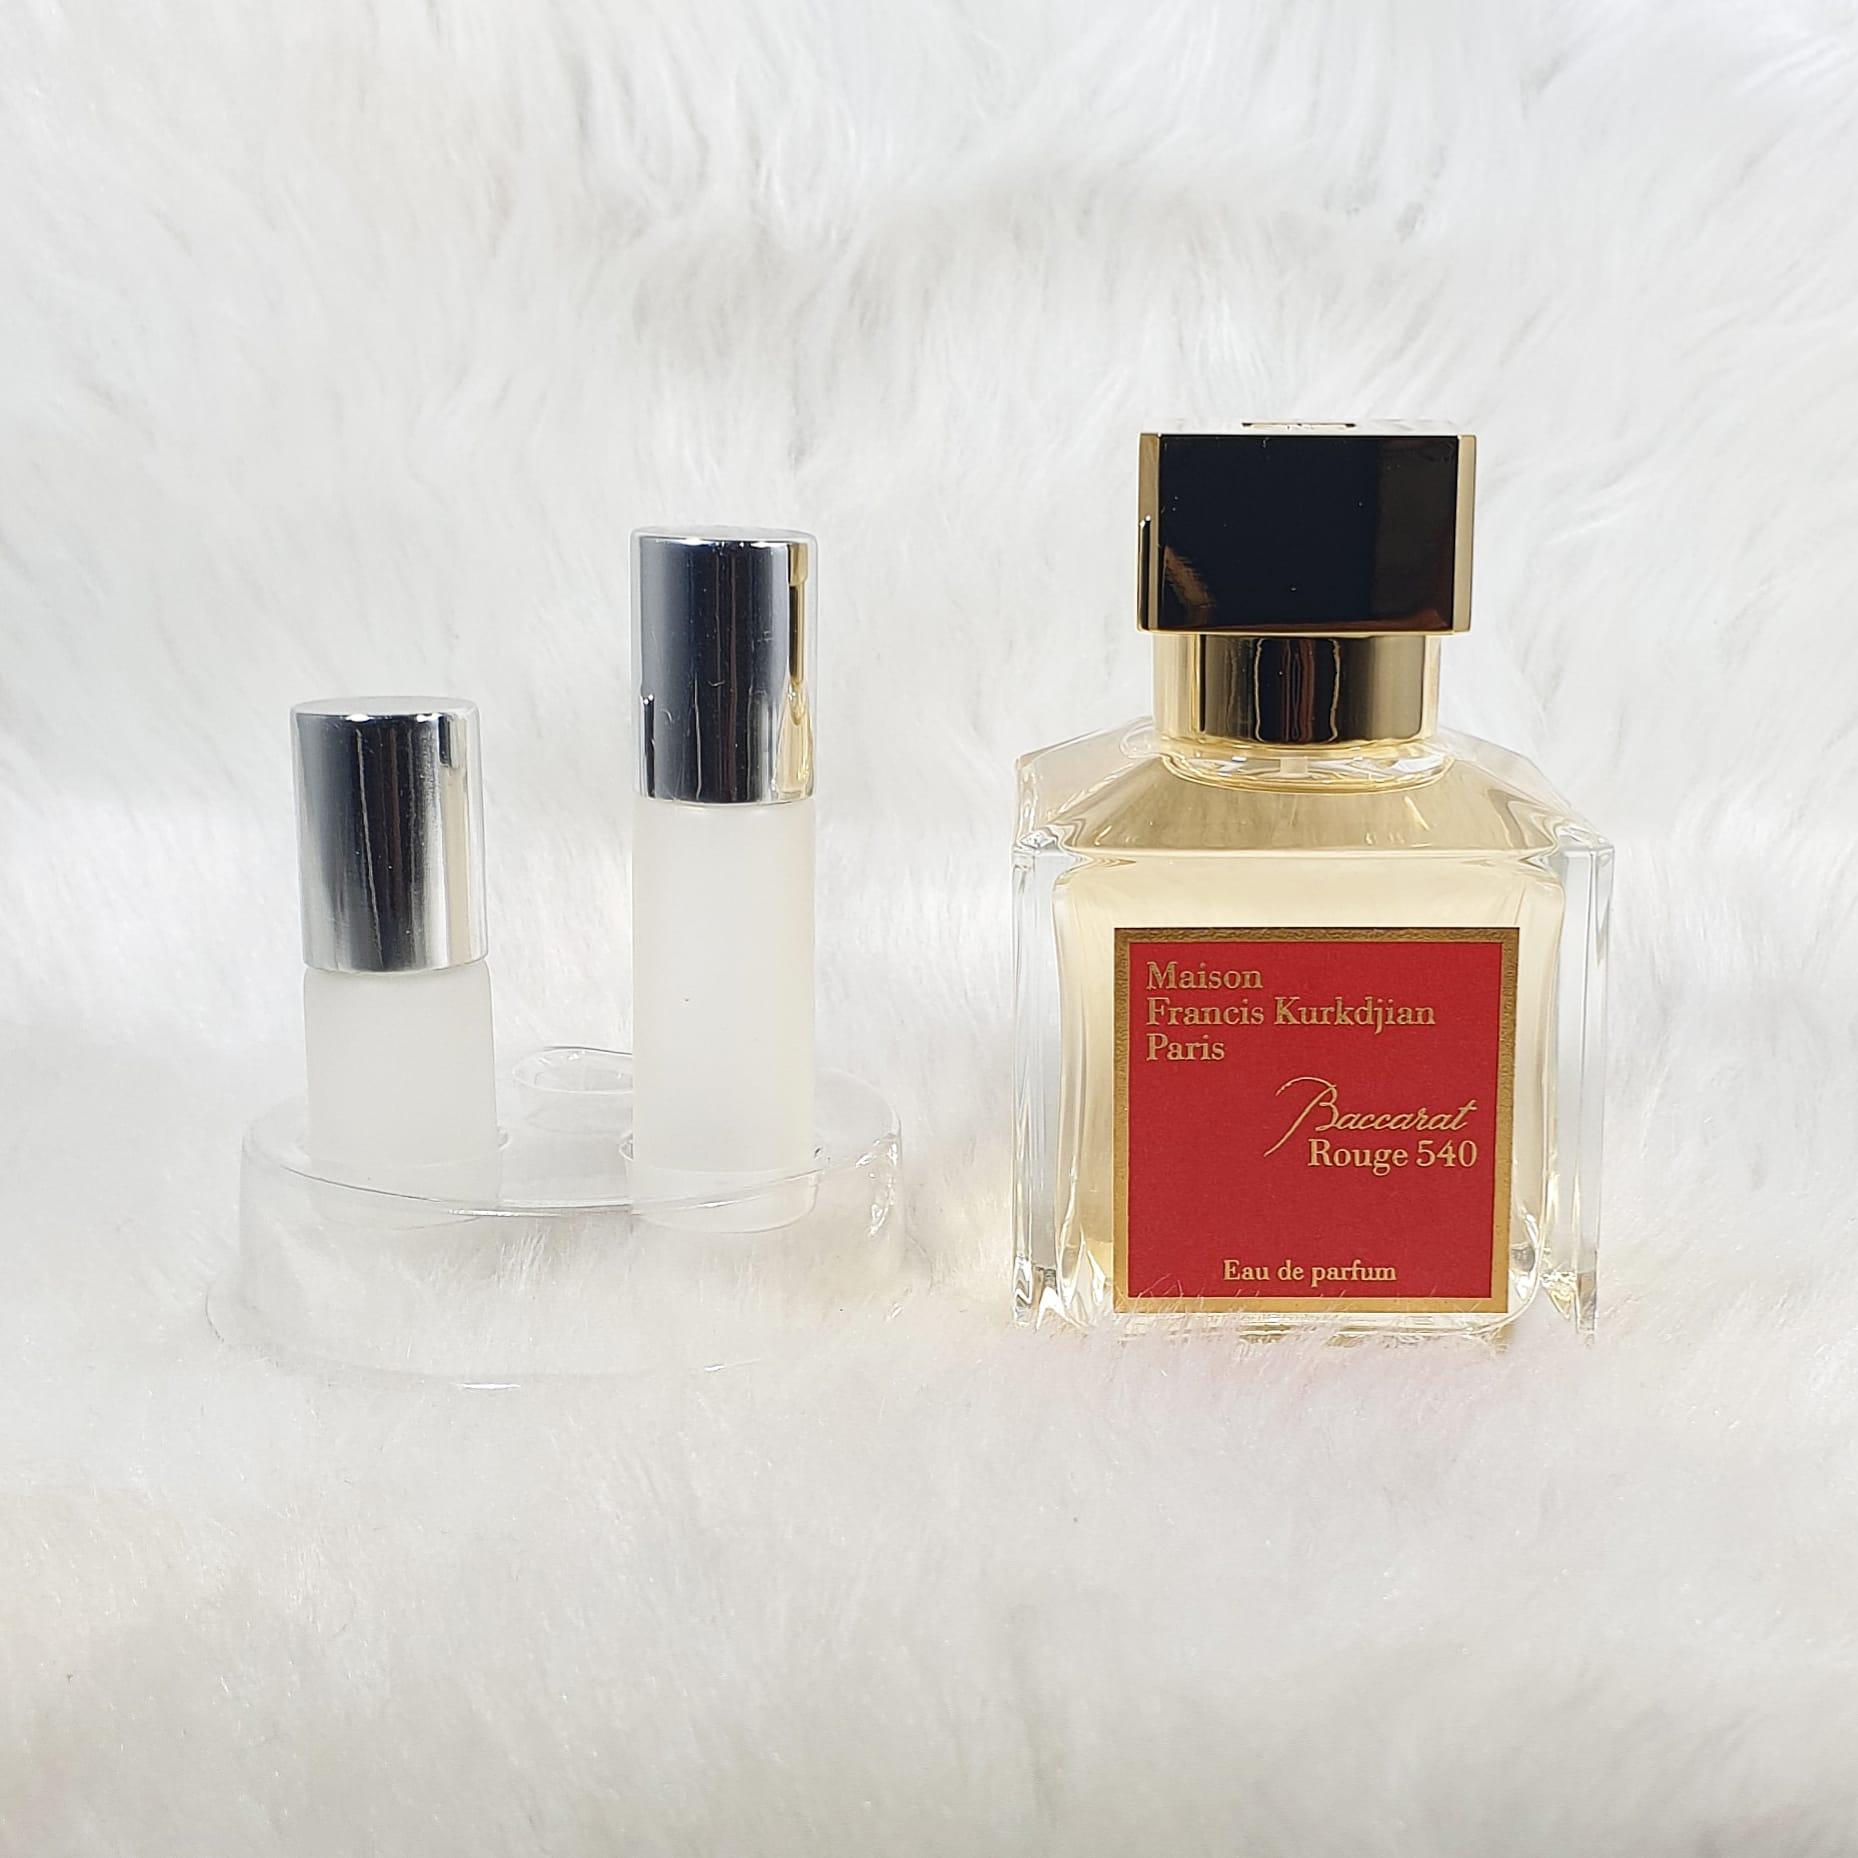 Mfk Baccarat Rouge 540 Eau De Parfum 3ml 5ml 10ml Original Perfume Decant Lazada Ph